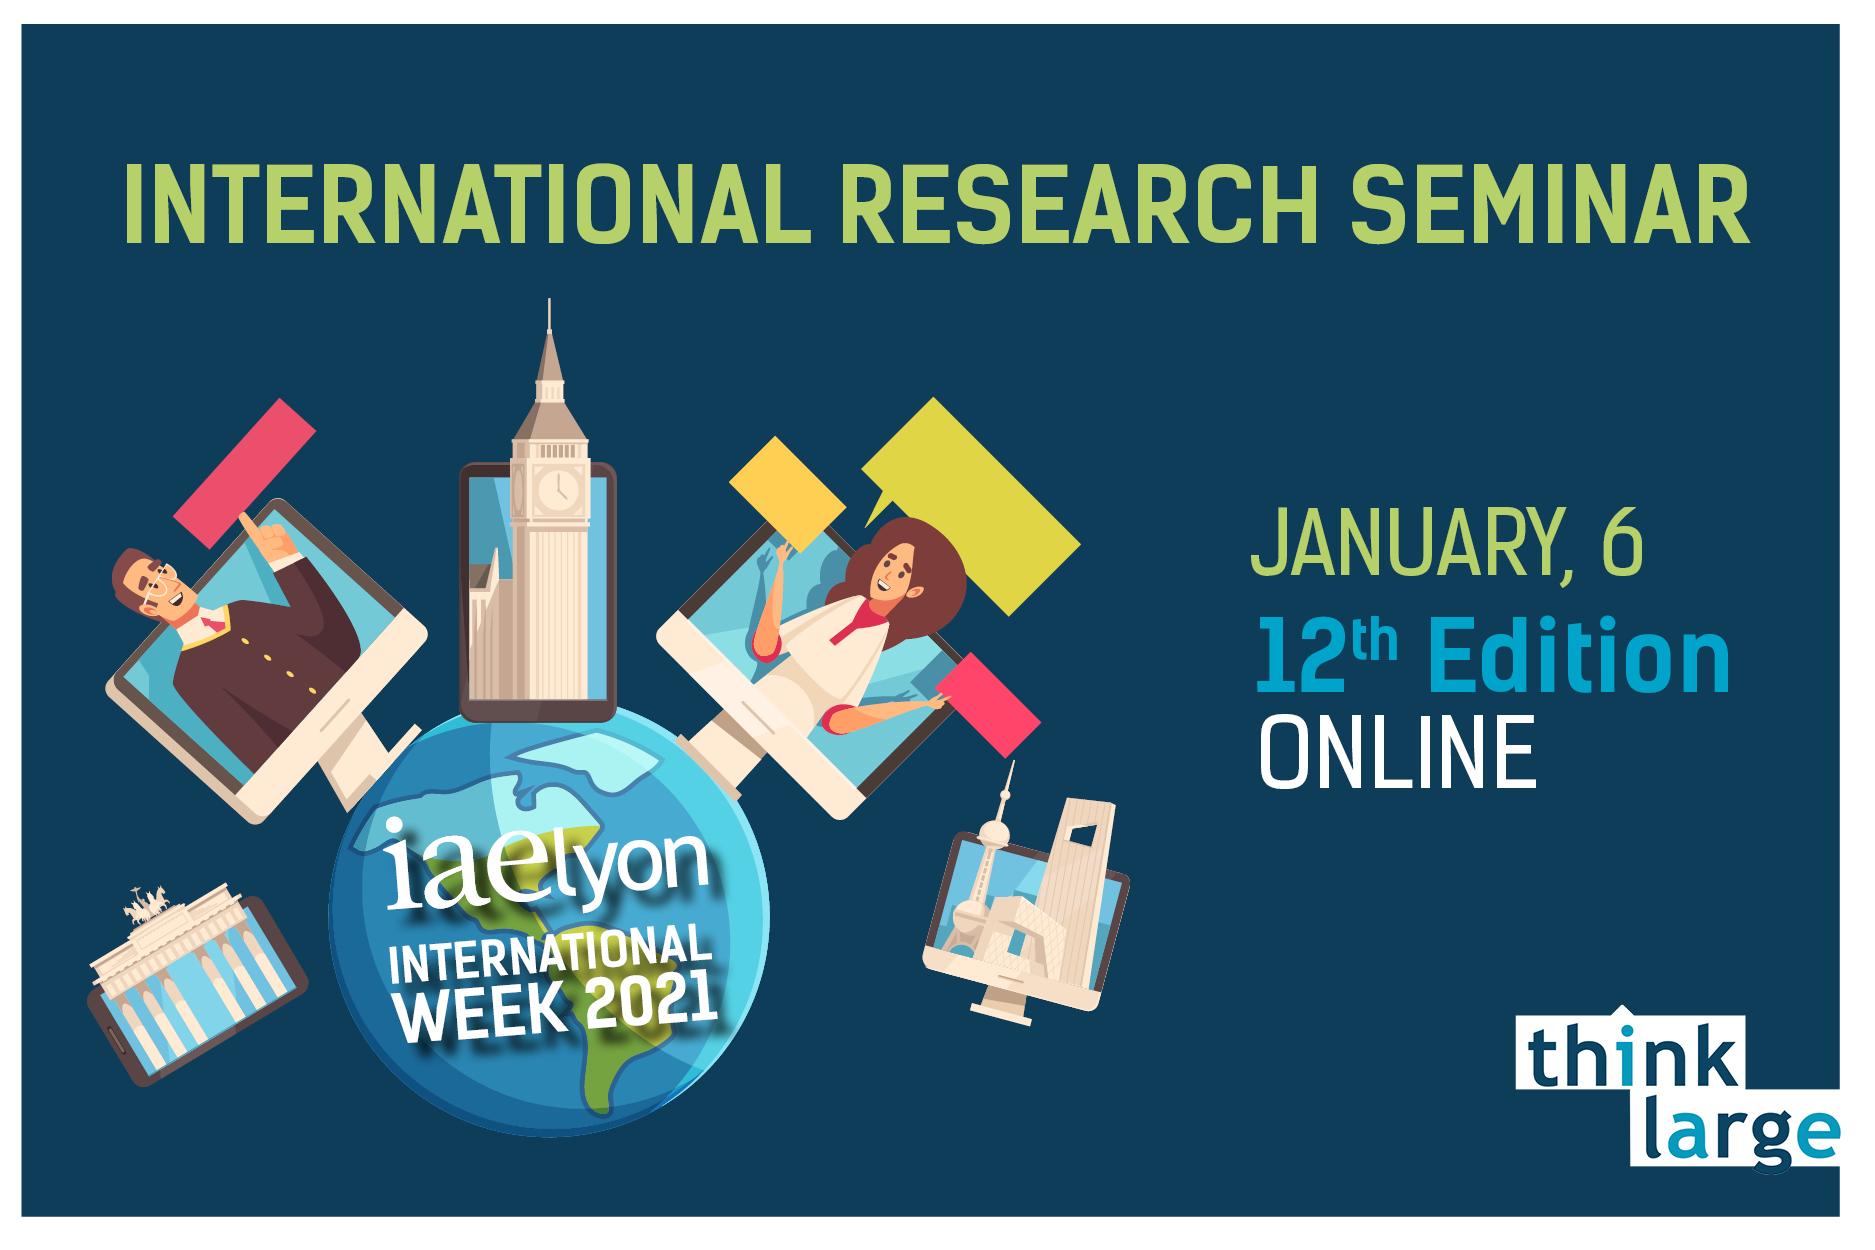 iaelyon International Research Seminar 2021